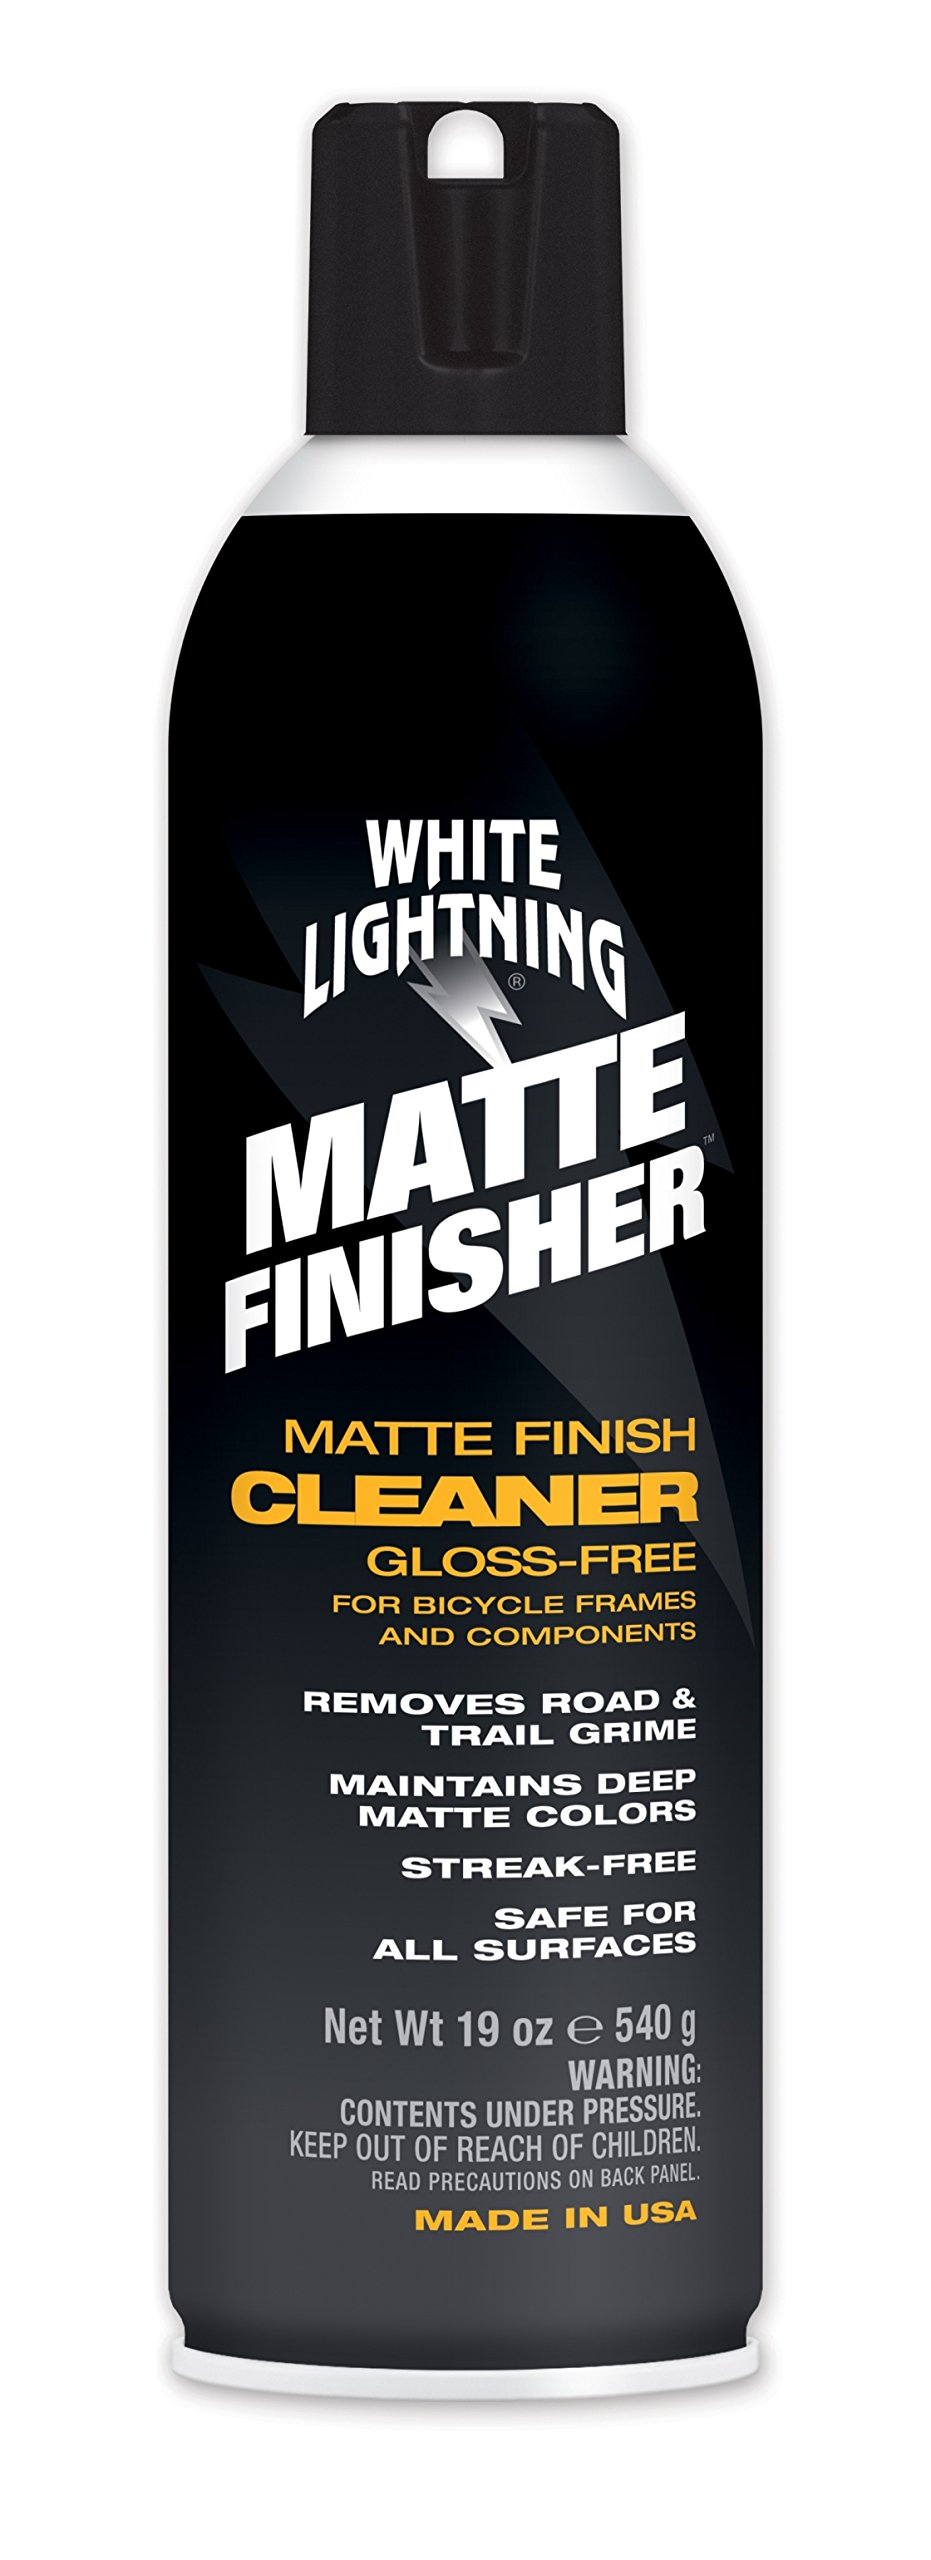 White Lightning - Matte Finisher, Aerosol Matte Finish Bicycle Cleaner, 19oz